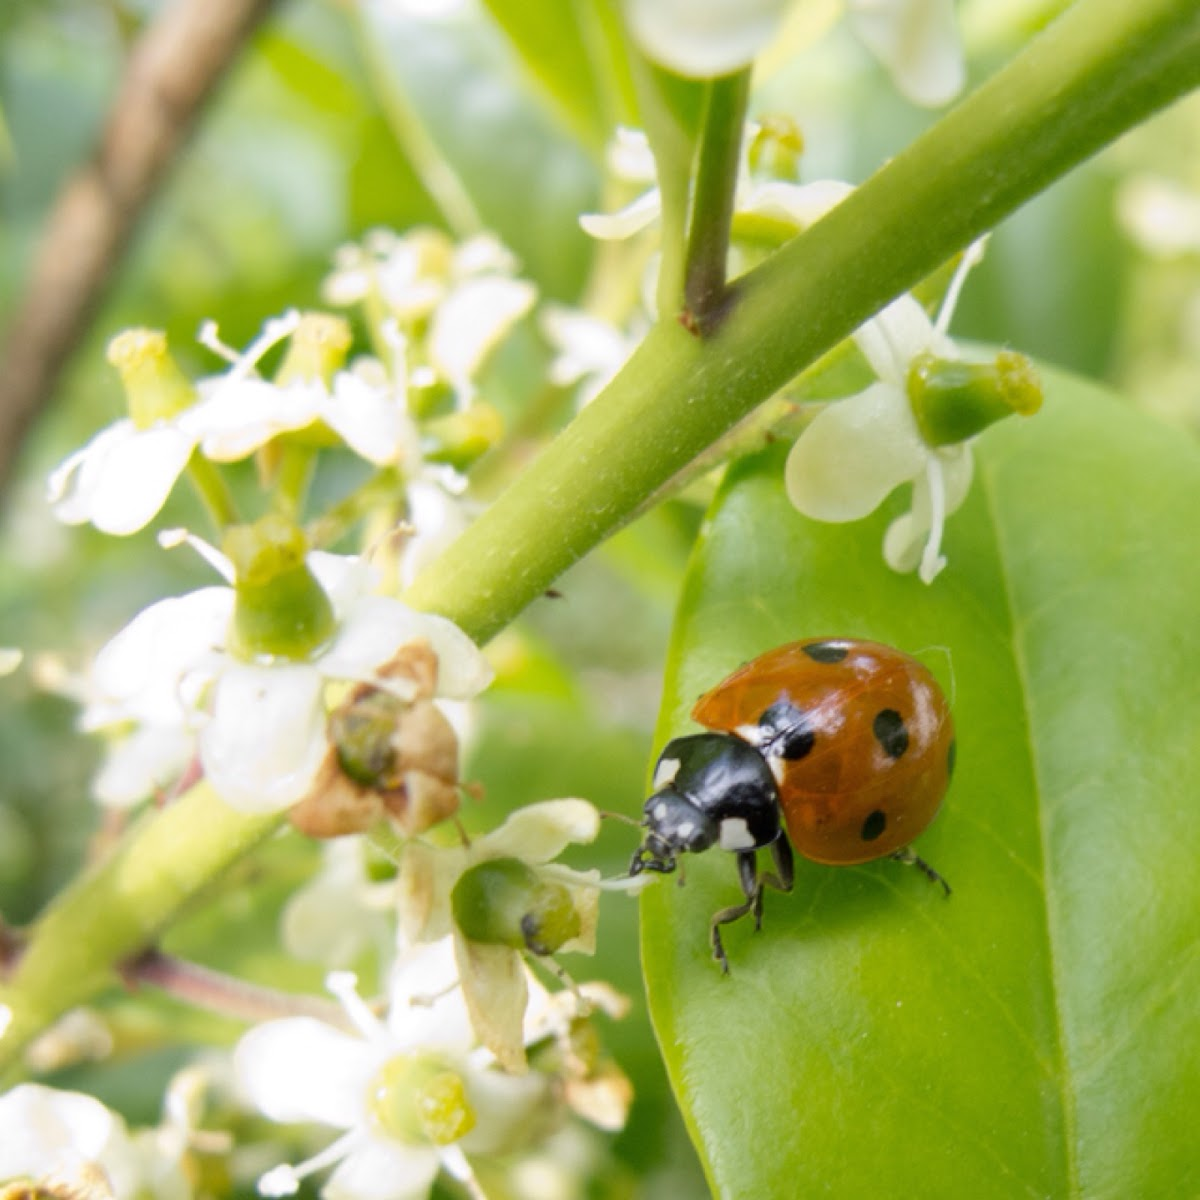 Seven spot ladybeetle